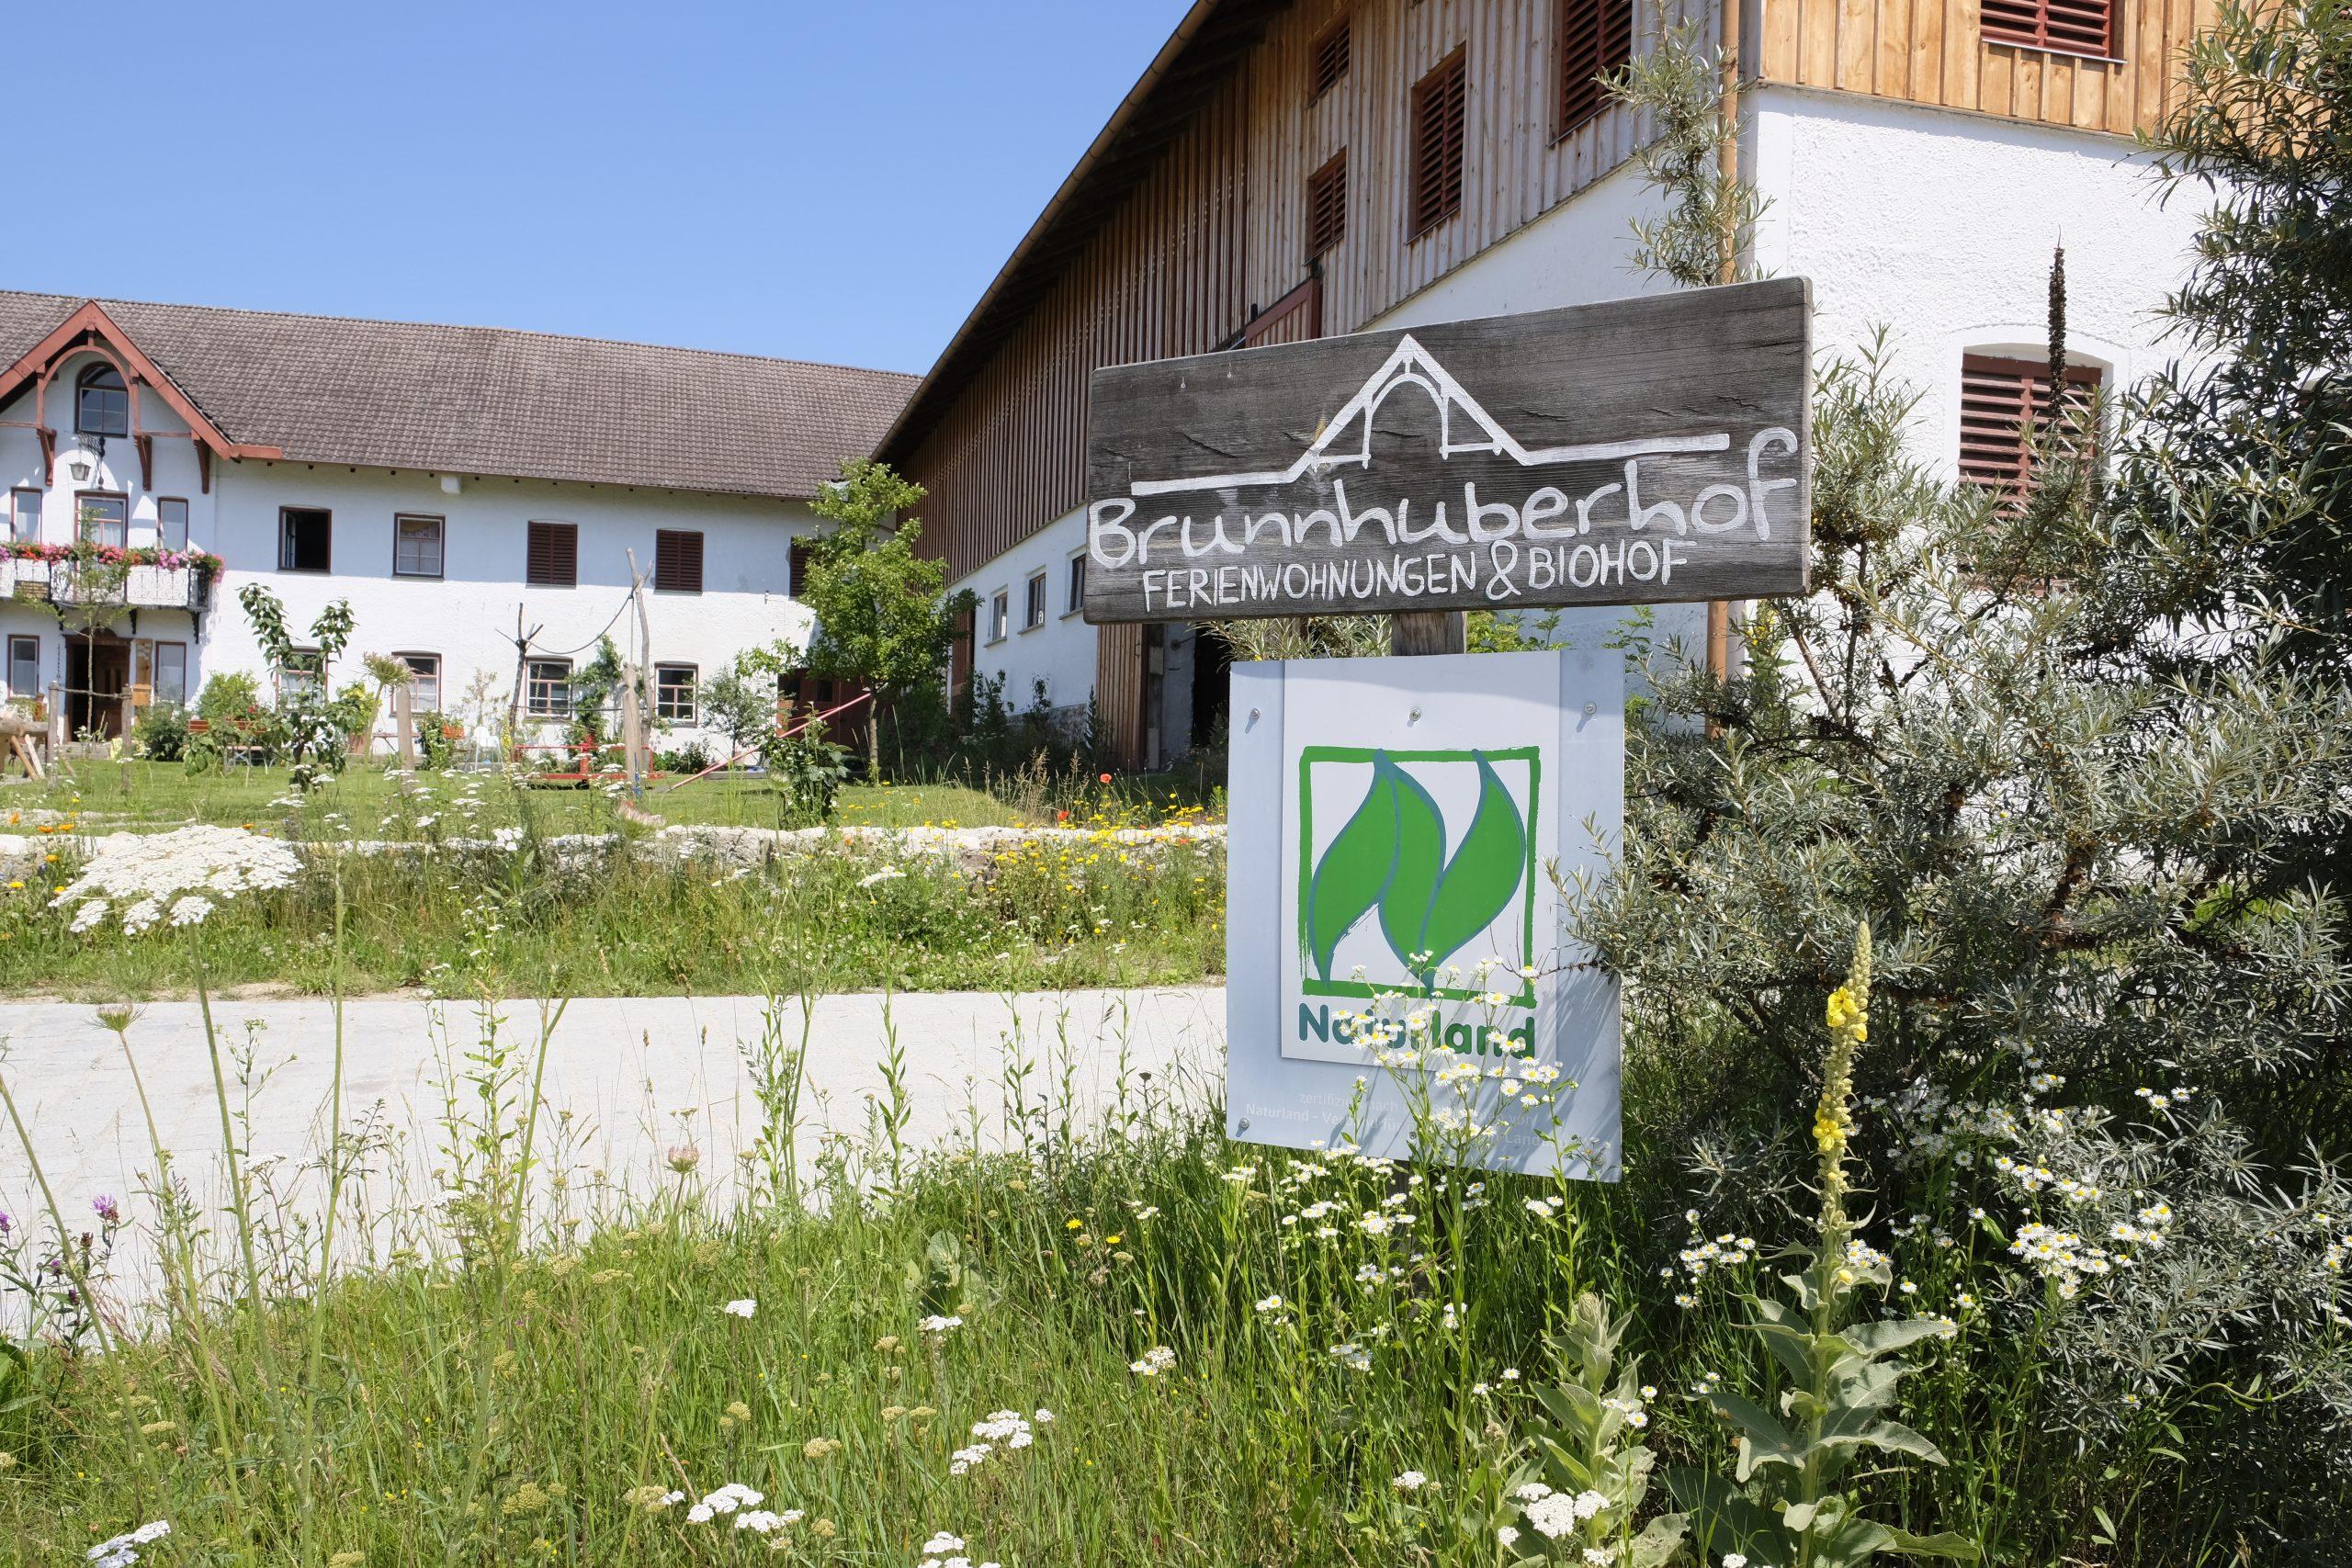 Brunnhuberhof